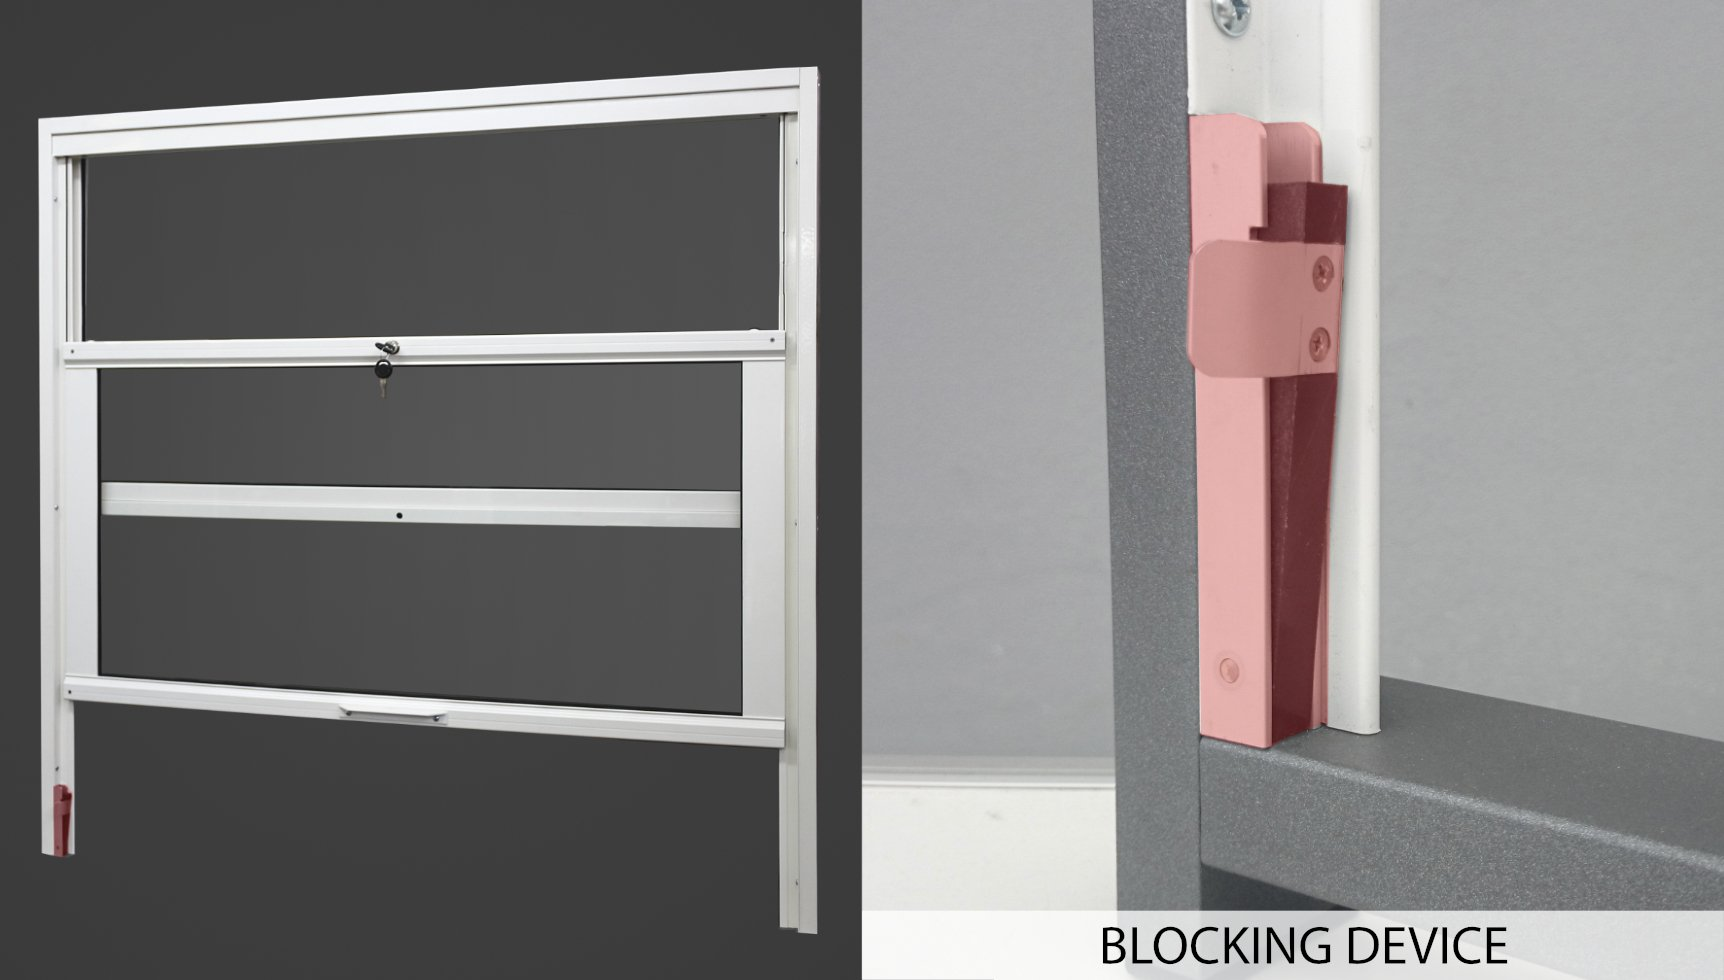 Blocking device | wireless Block device